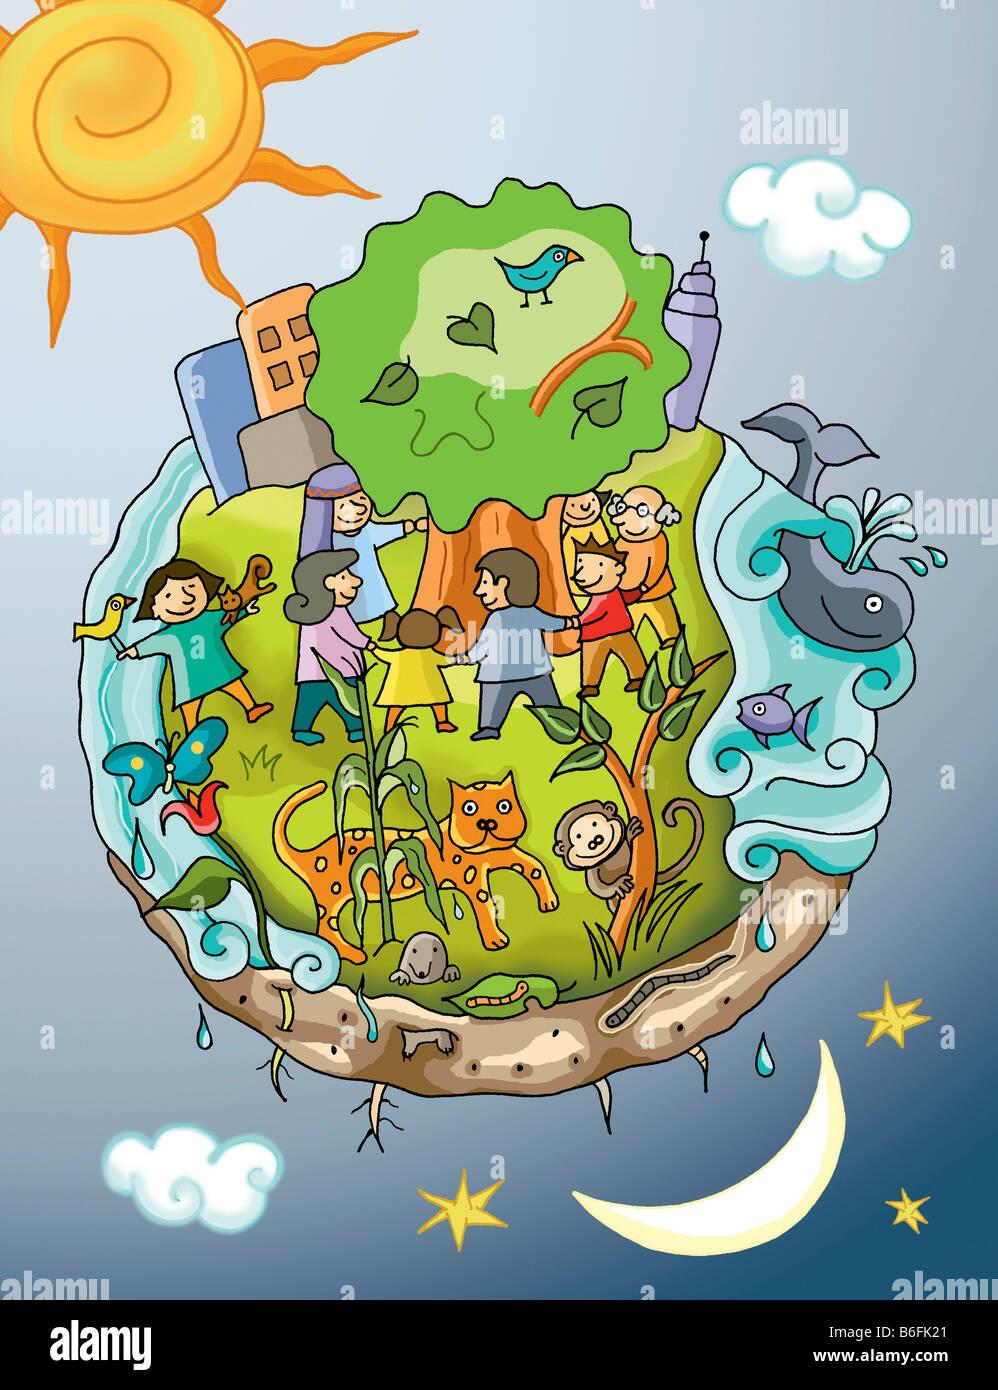 Illustration world and enviroment - Stock Image